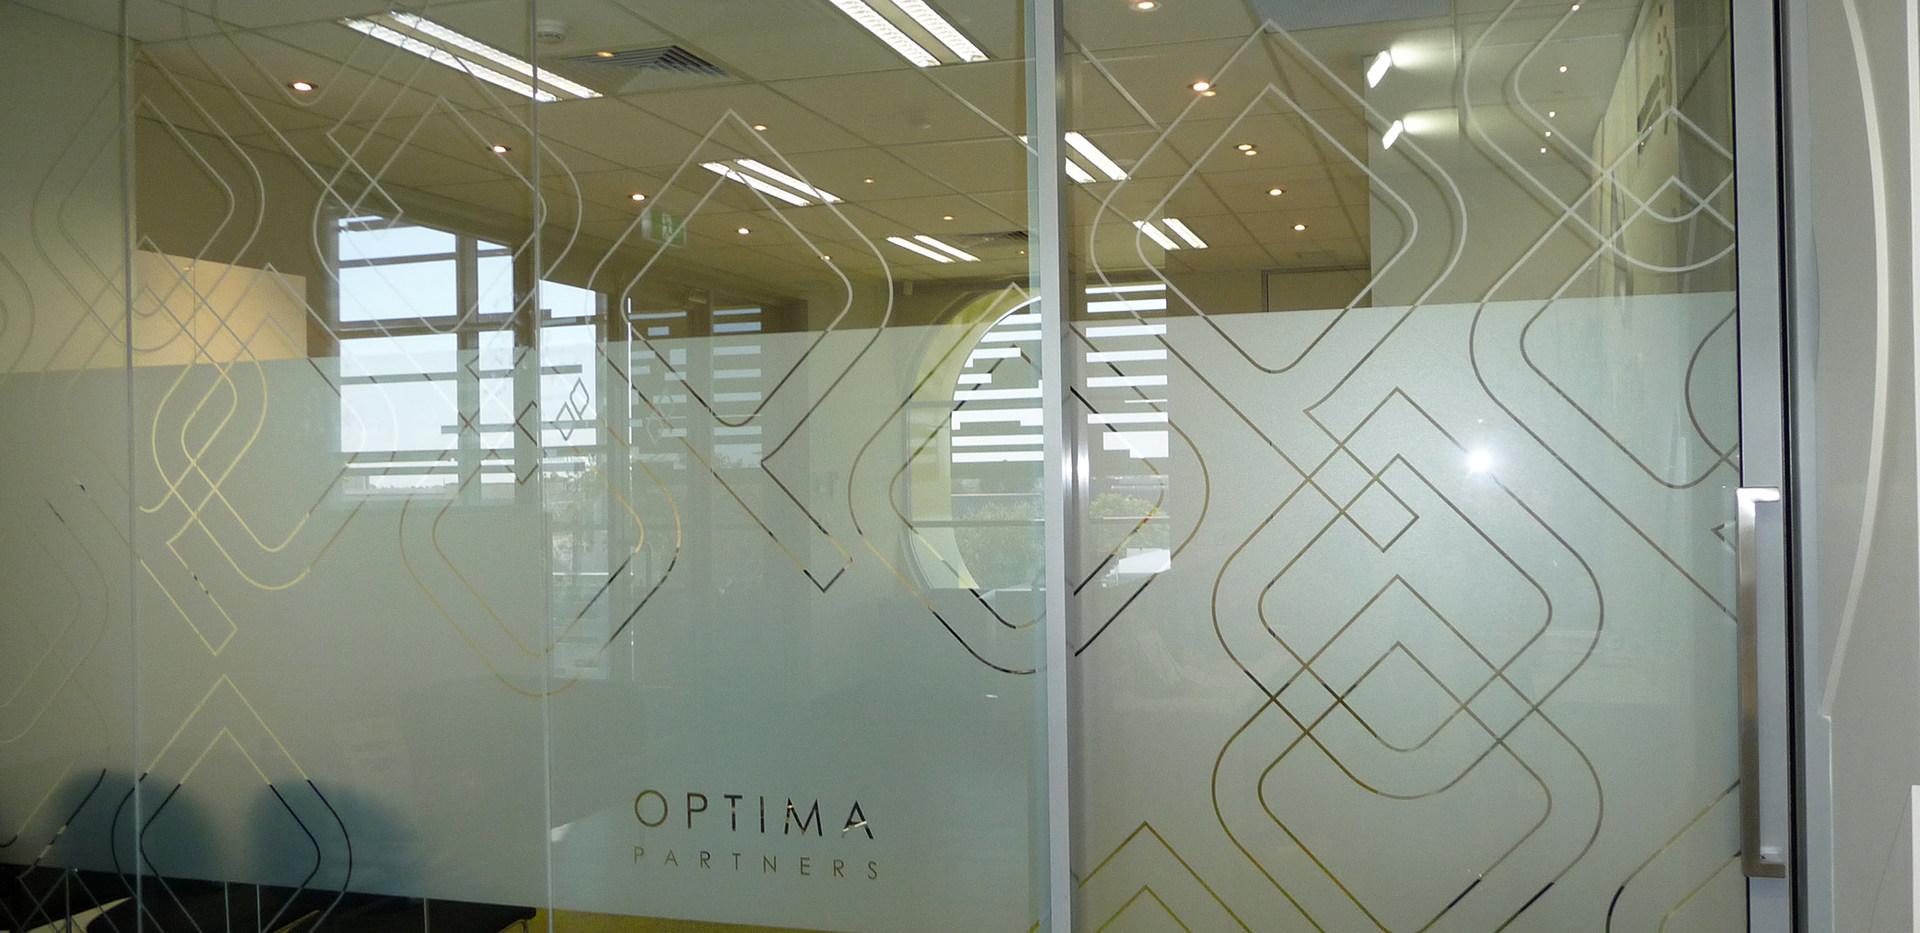 optima-office-signage-1.jpg